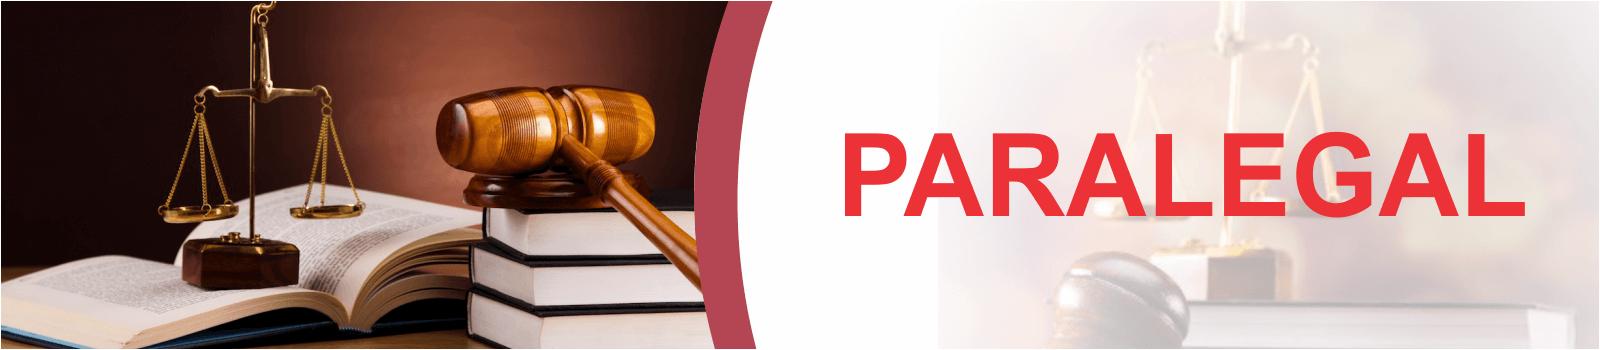 paralegal practice hillcross business college johannesburg